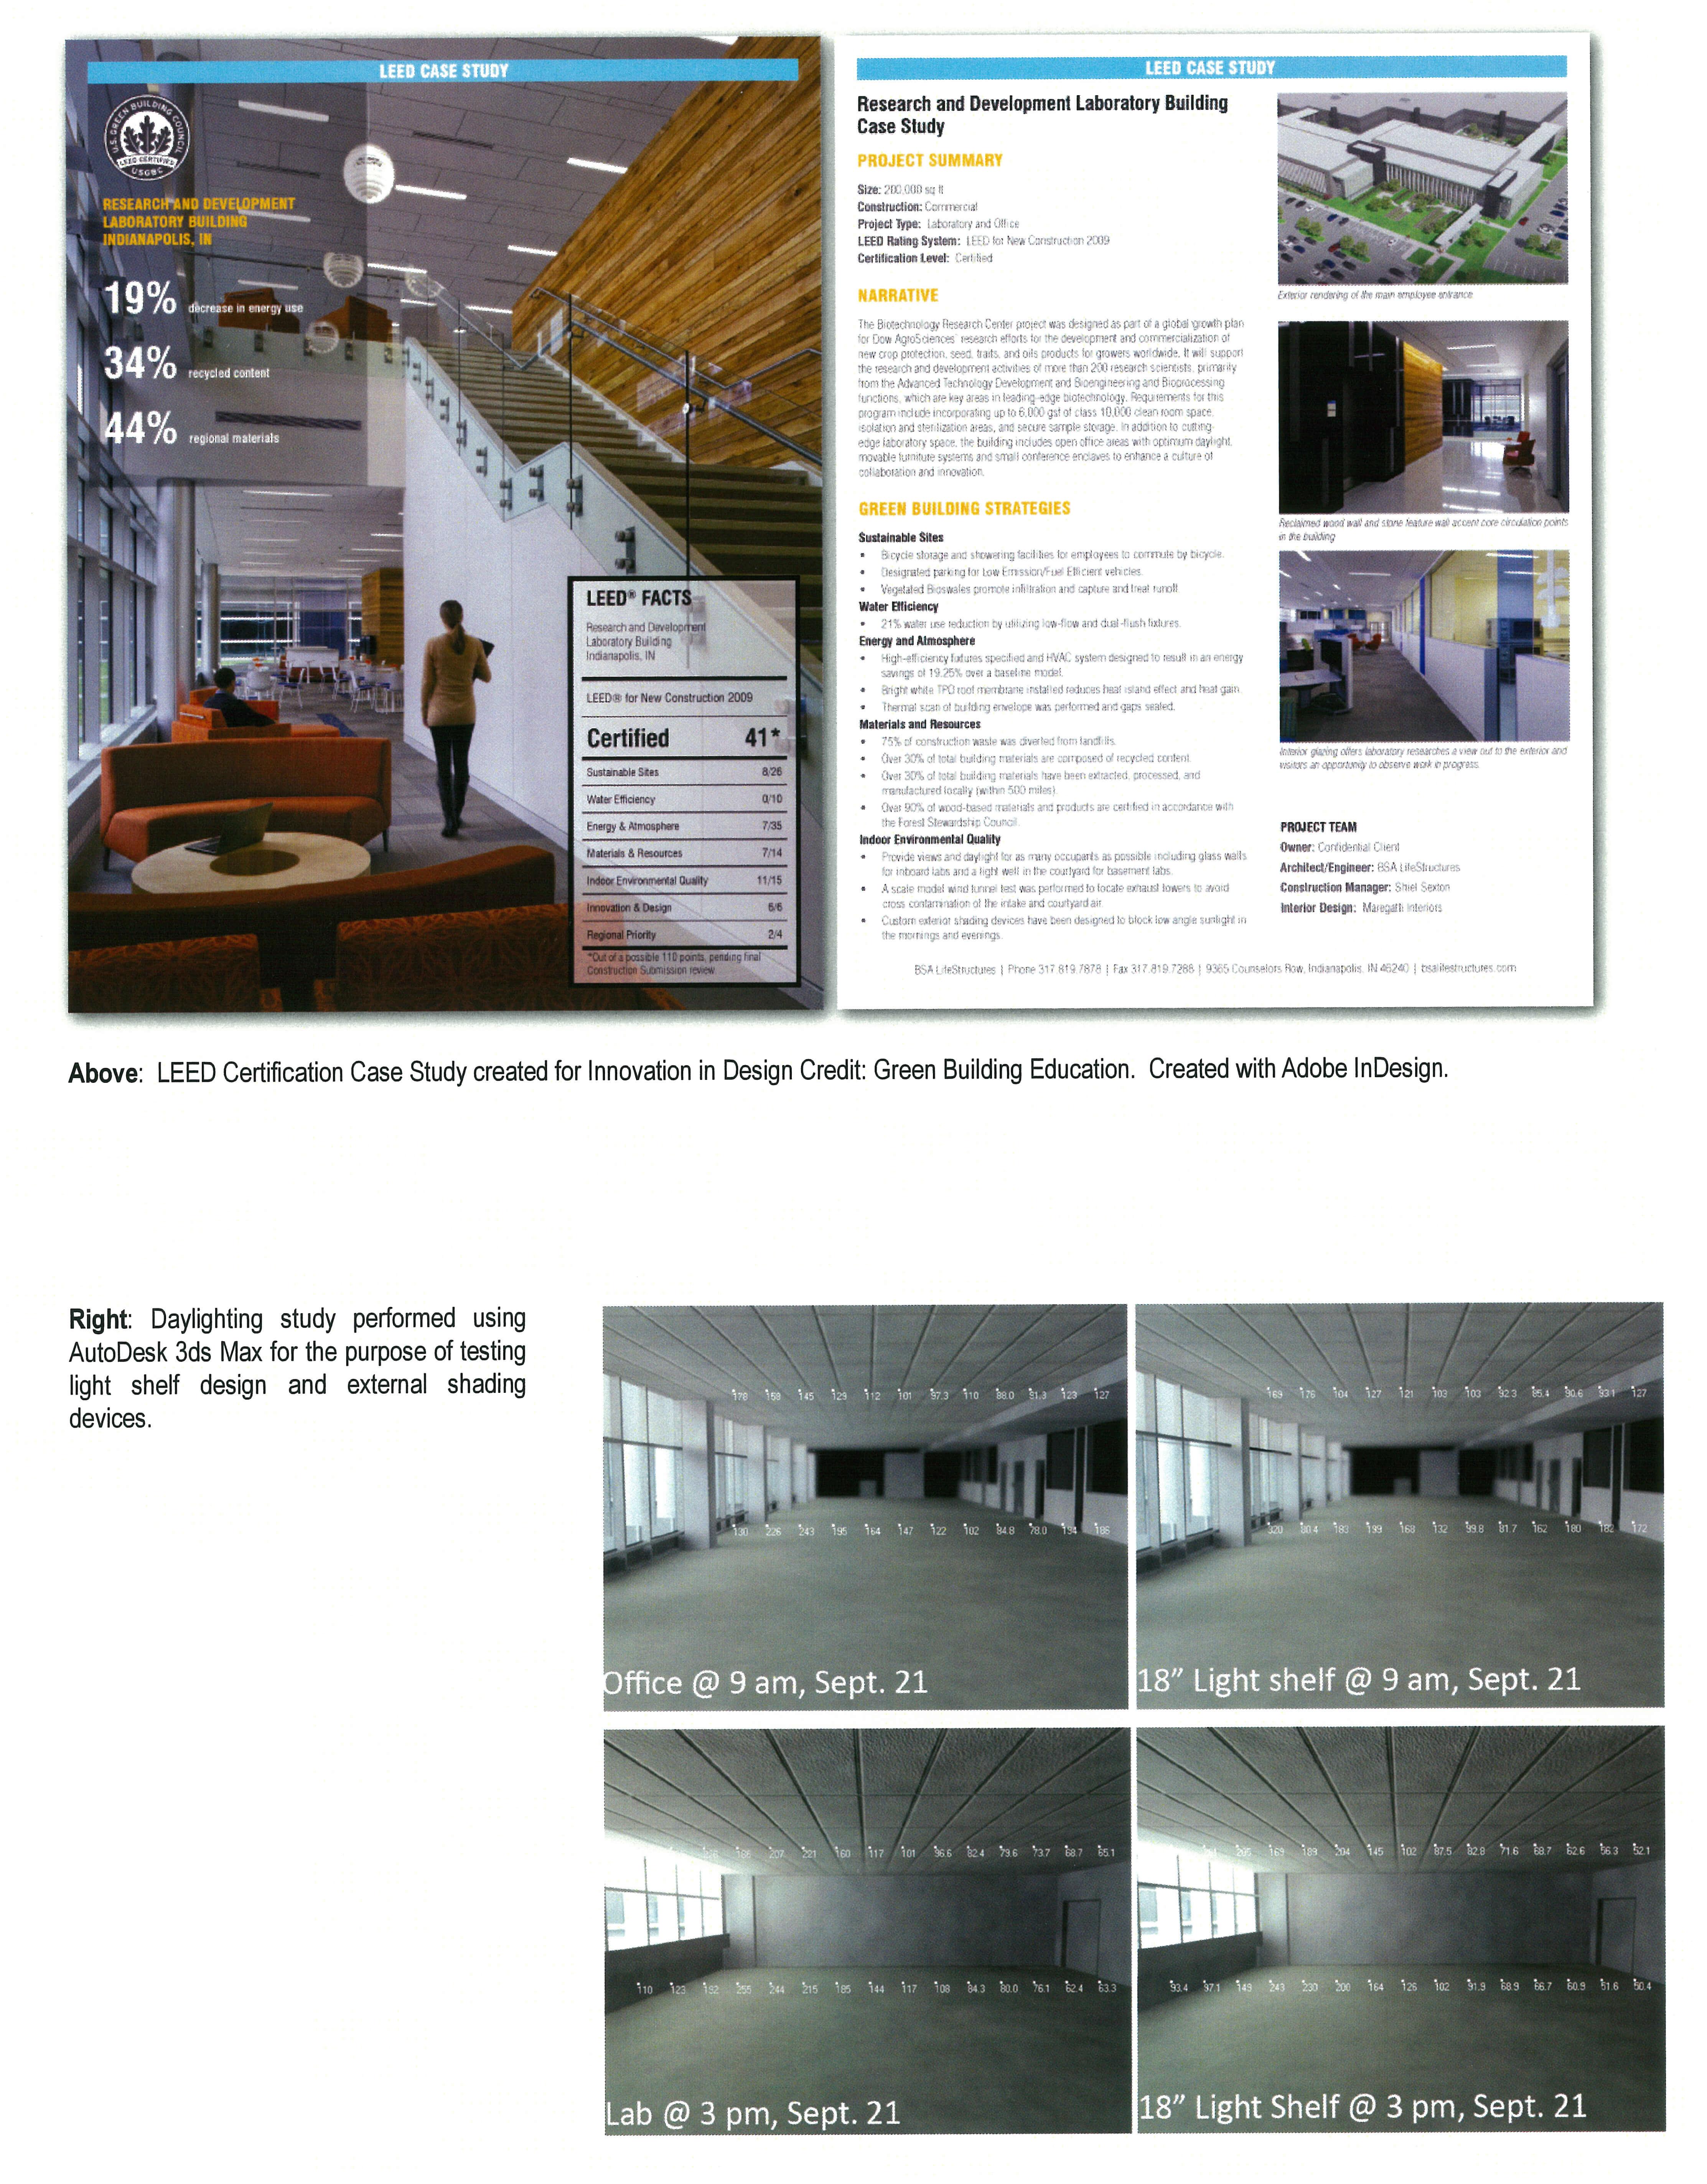 314-leed-light-study